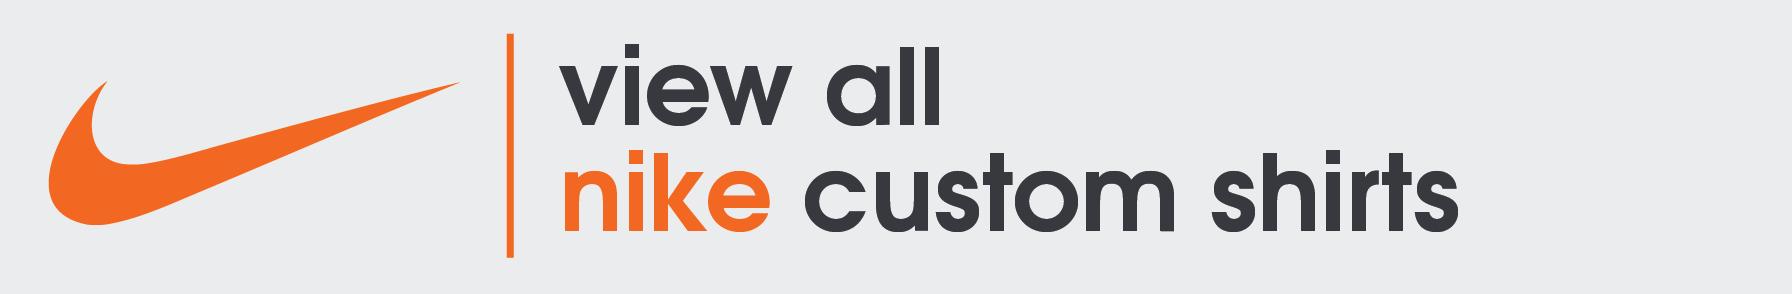 Customize Nike Shirts and Tees